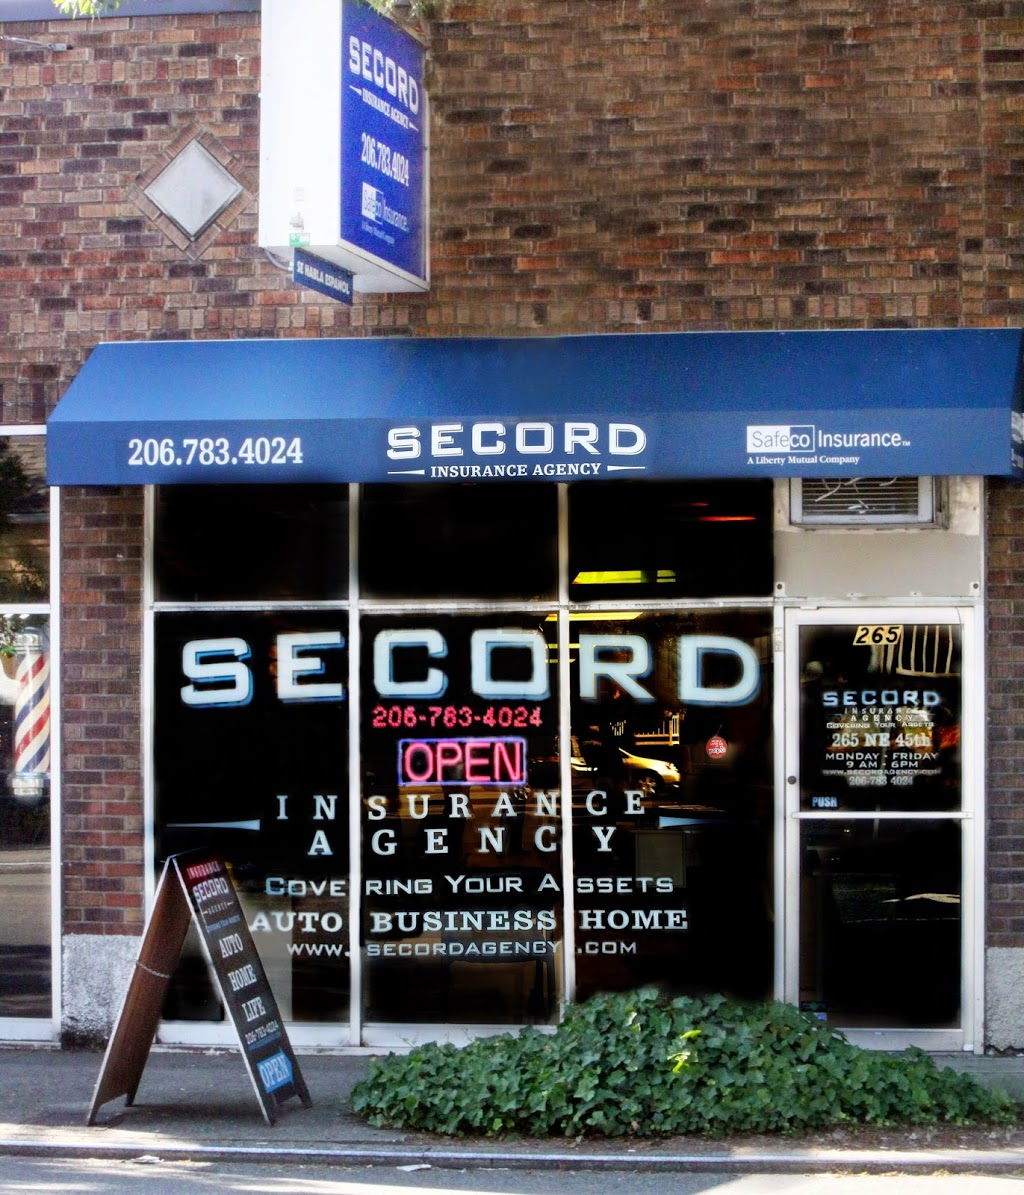 Secord Agency Insurance | insurance agency | 265 NE 45th St, Seattle, WA 98105, USA | 2067834024 OR +1 206-783-4024